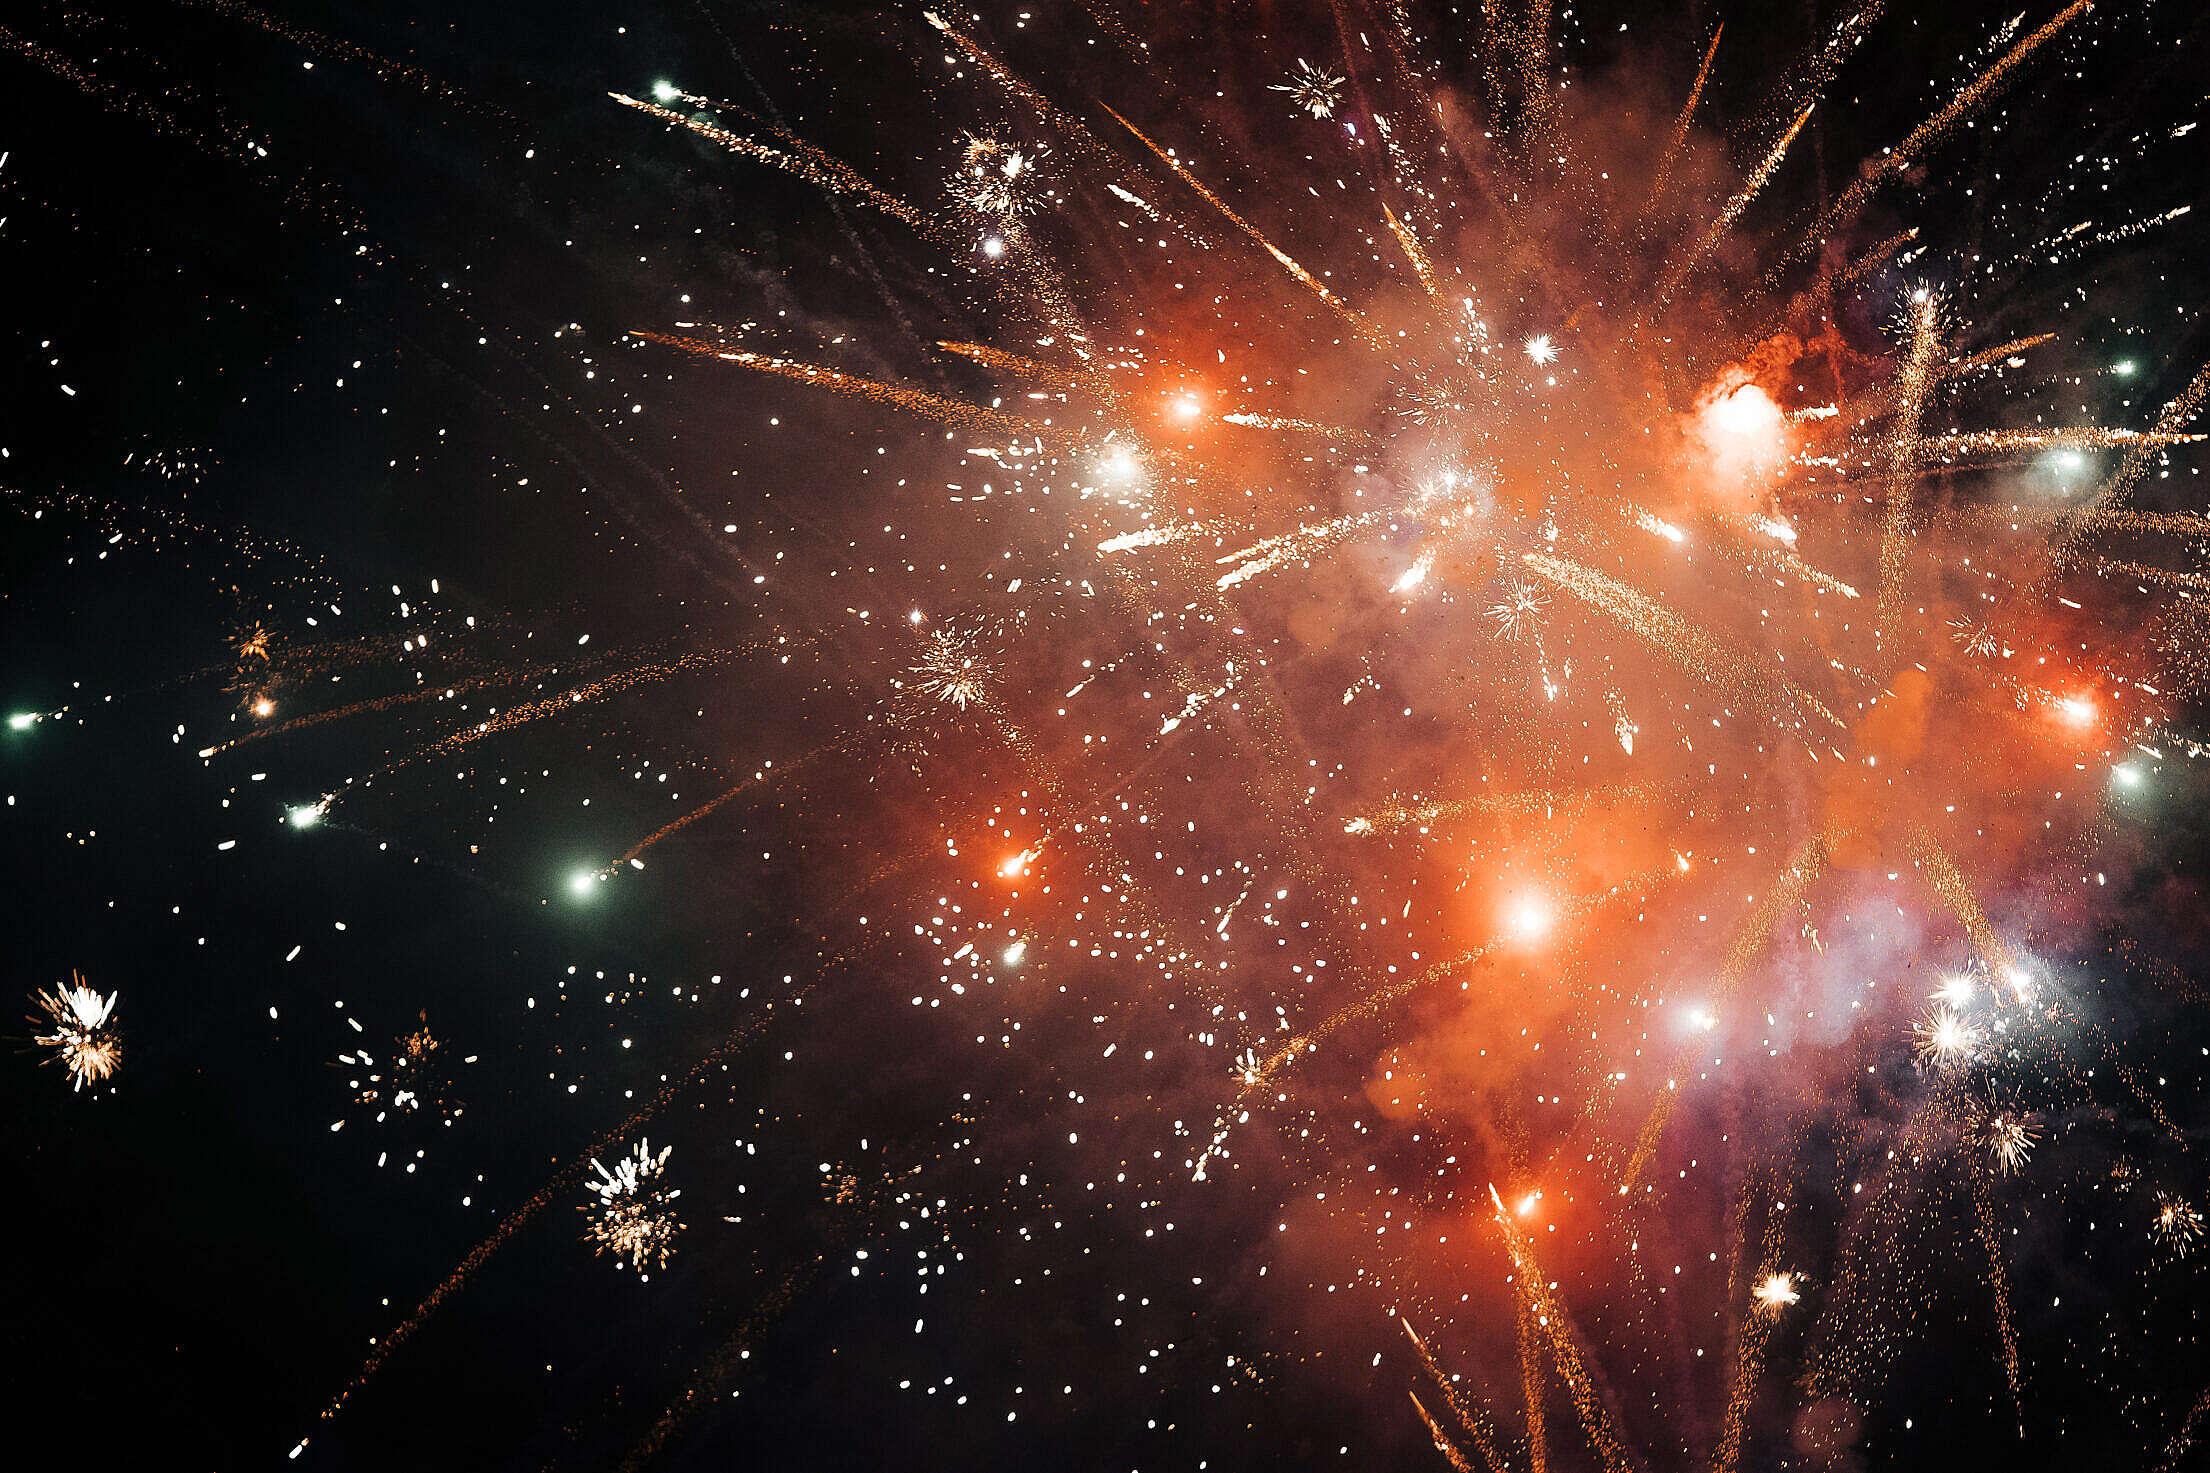 Golden Fireworks Free Stock Photo